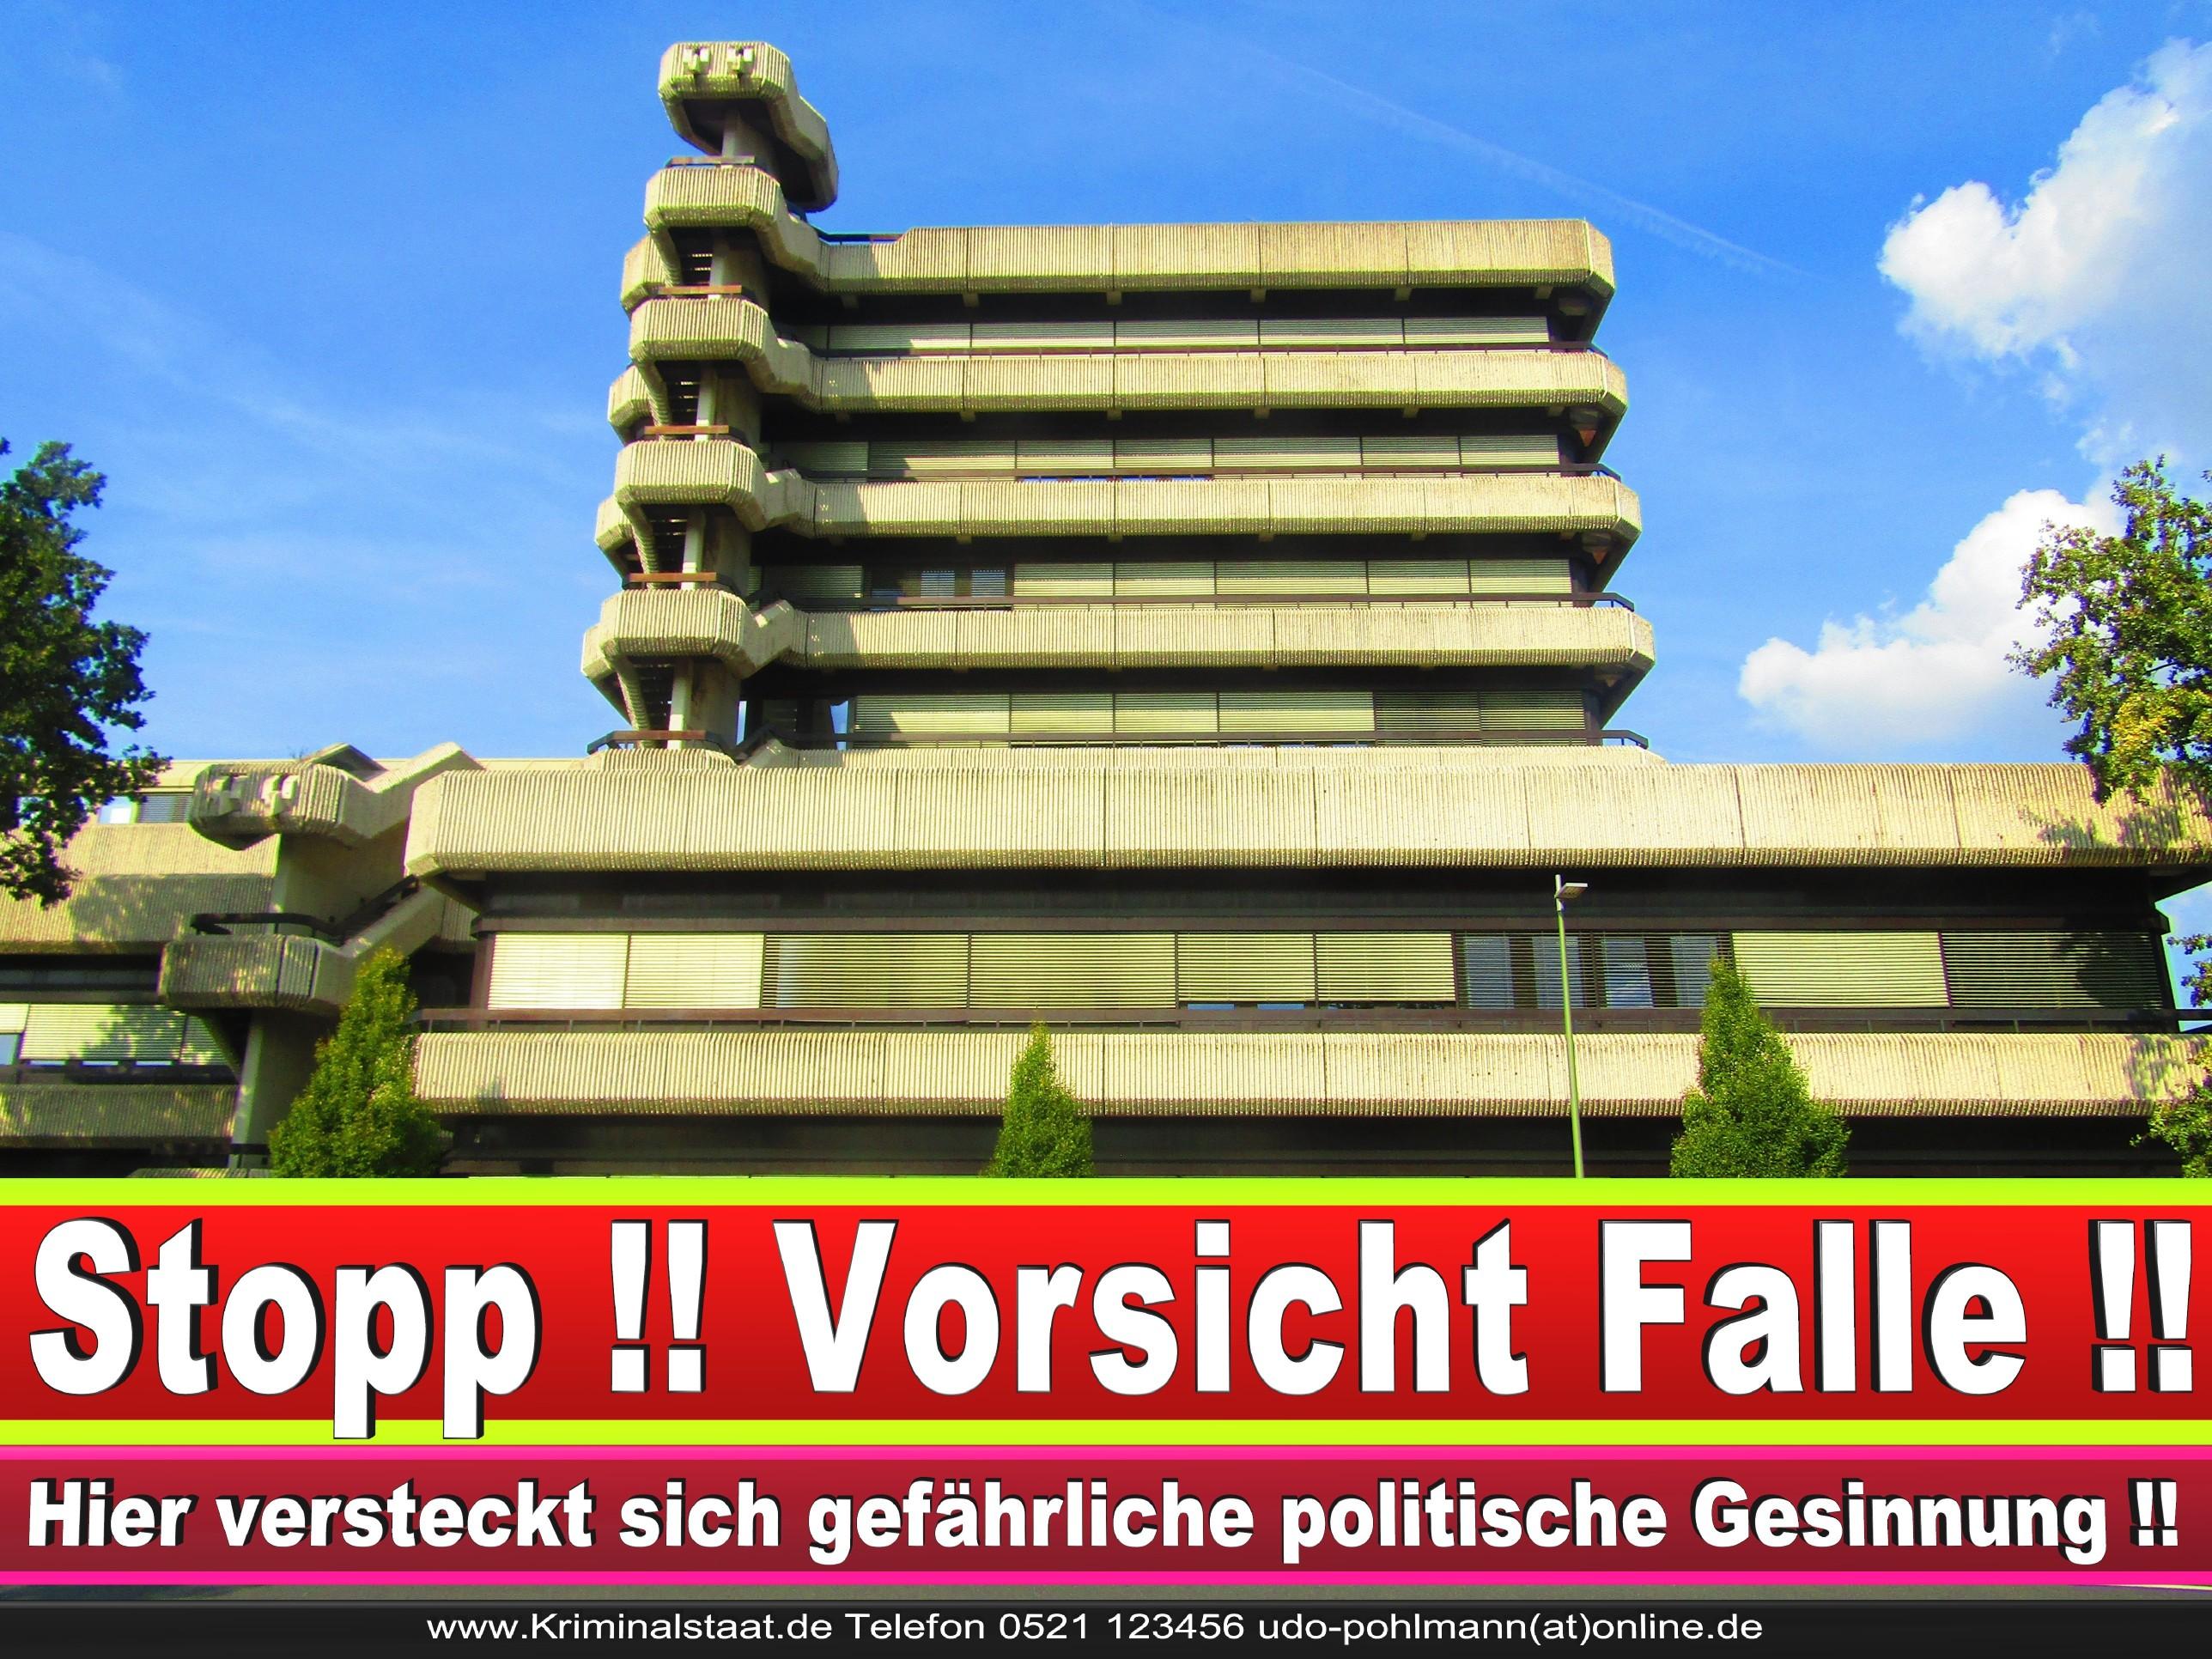 SPARKASSE BIELEFELD ANDREAS RÜTHER CDU BIELEFELD 1 LANDTAGSWAHL BUNDESTAGSWAHL BÜRGERMEISTERWAHL